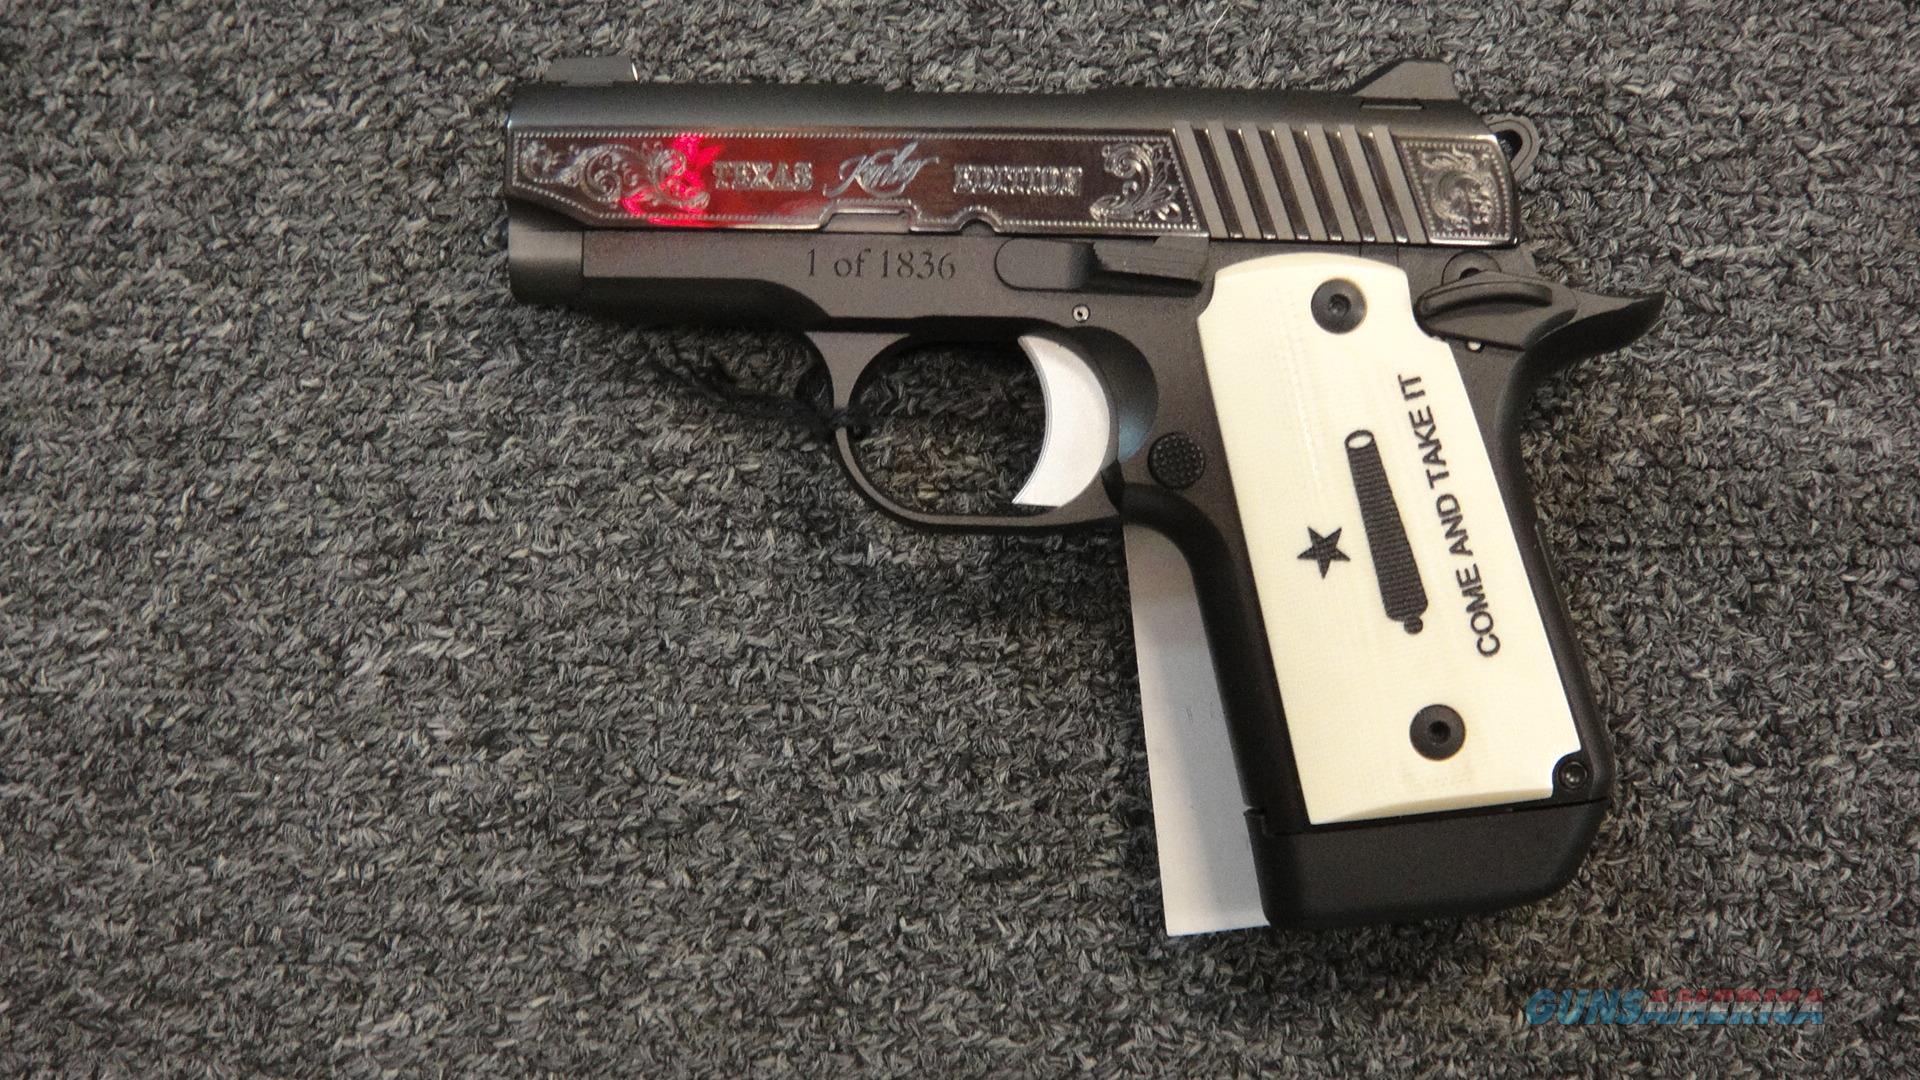 Kimber Micro 9 Texas Edition 1 of 1836  Guns > Pistols > Kimber of America Pistols > Micro 9